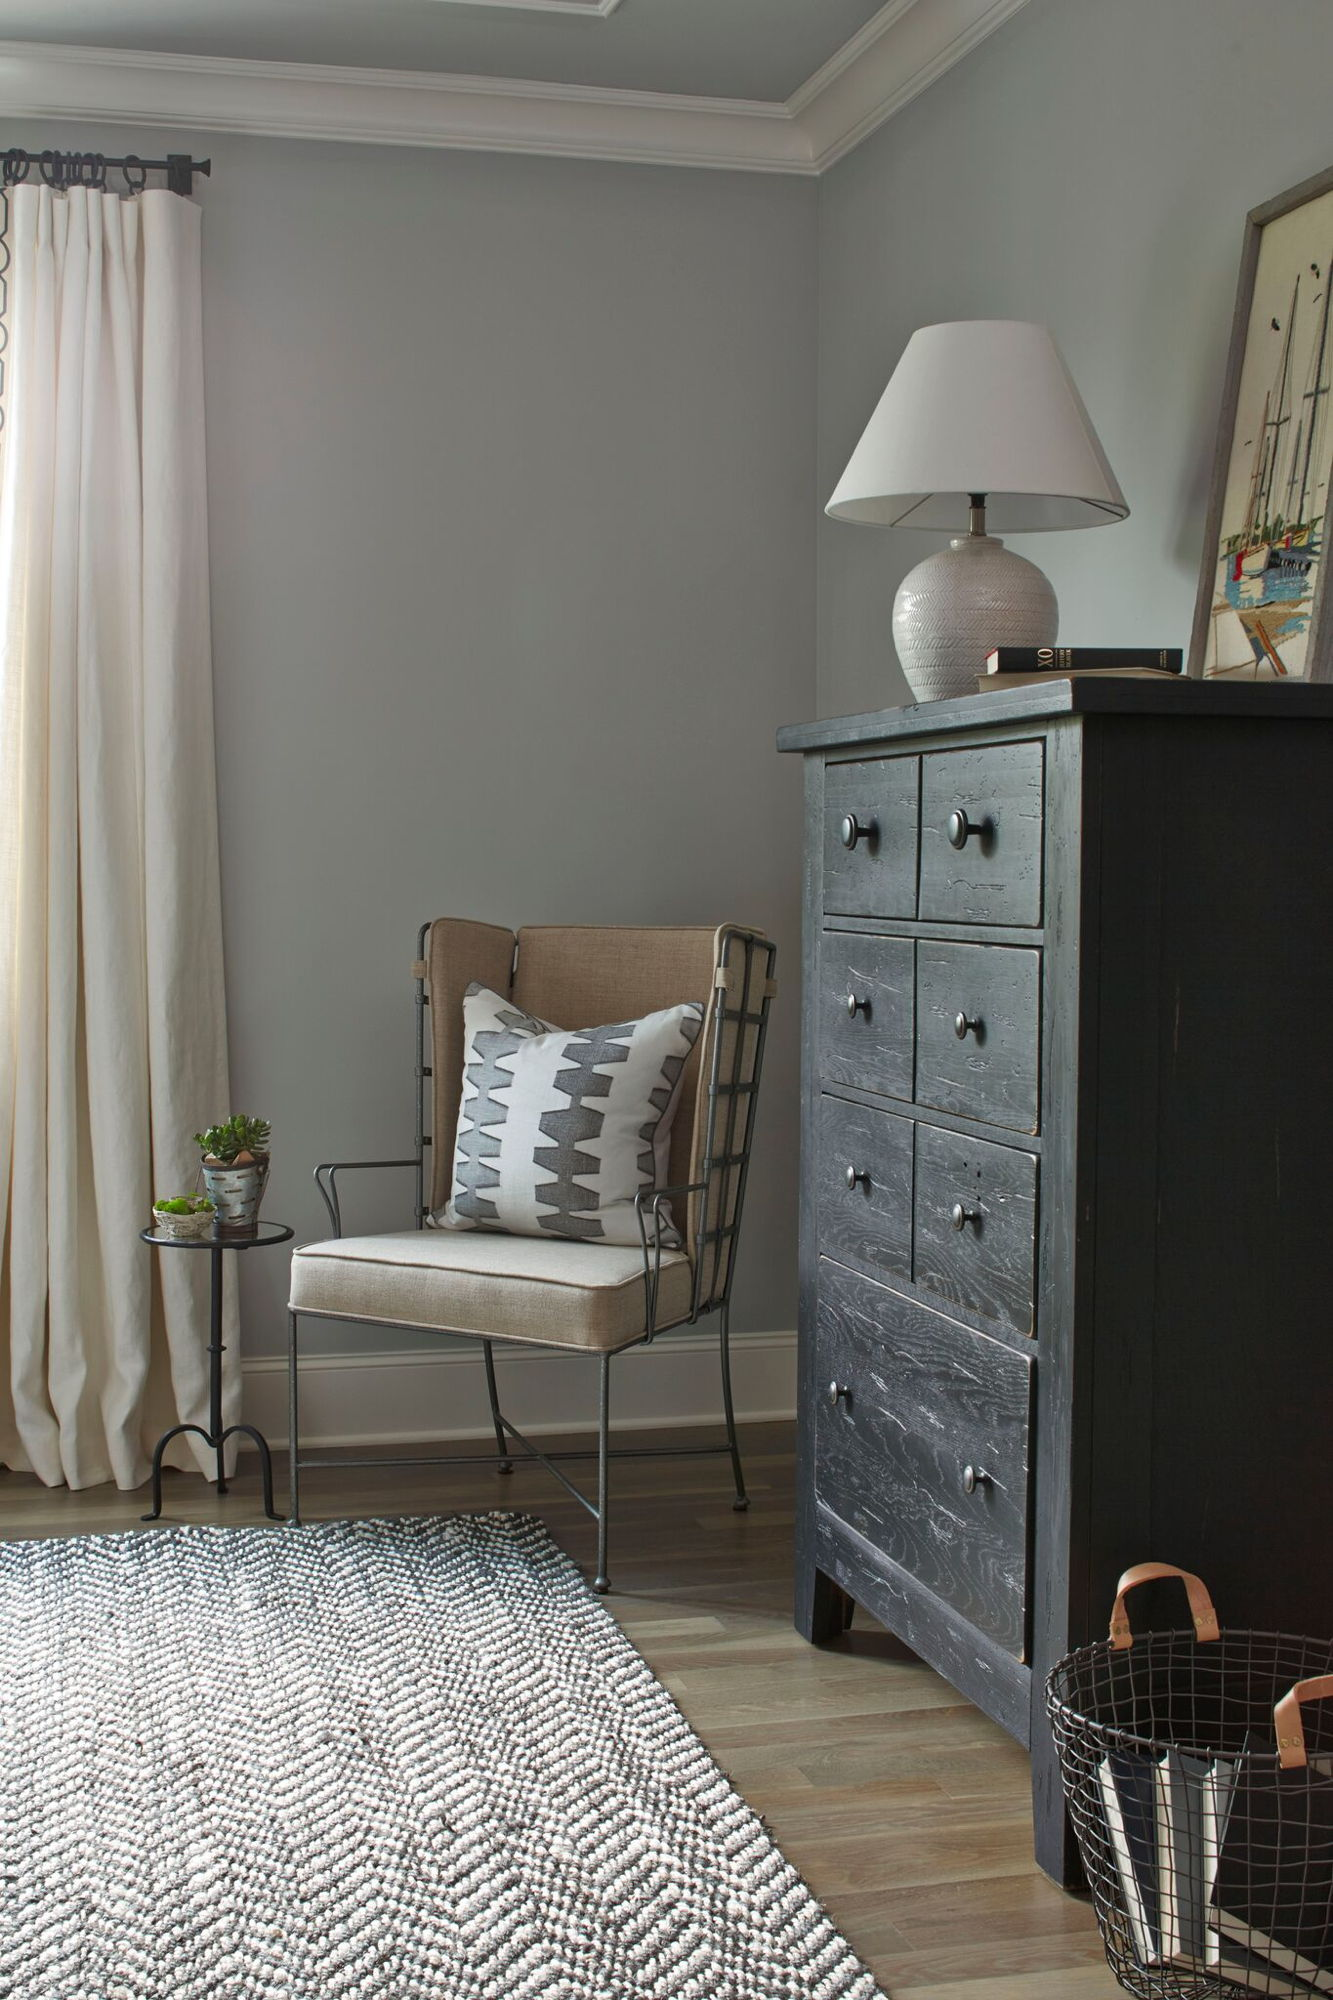 Lisa-Gabrielson-Designunspecified-23.jpg